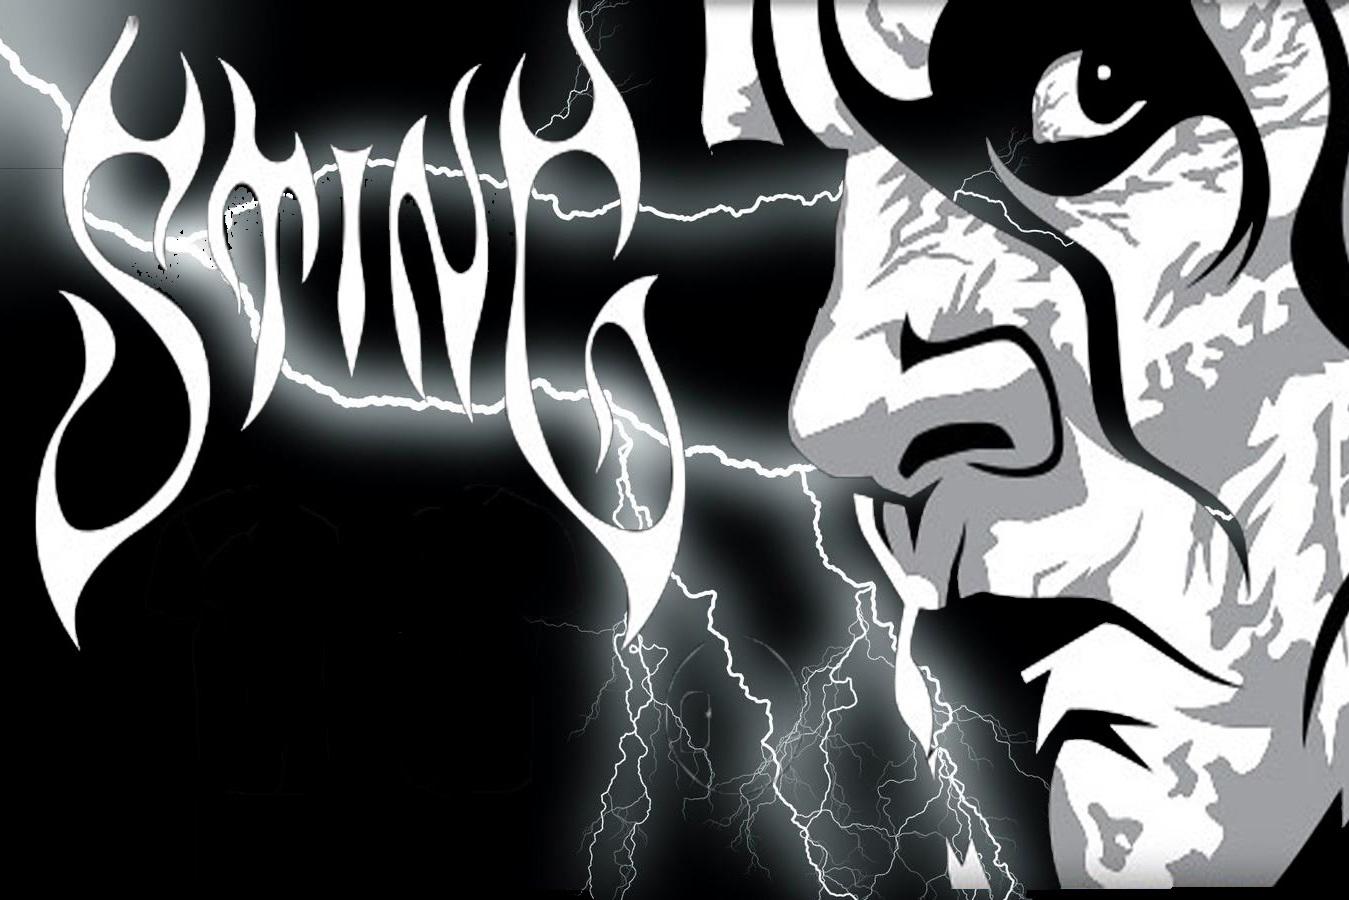 Joker 3d Hd Wallpapers The Dominate Wrestling Fancast Sting Entering Wwe Hall Of